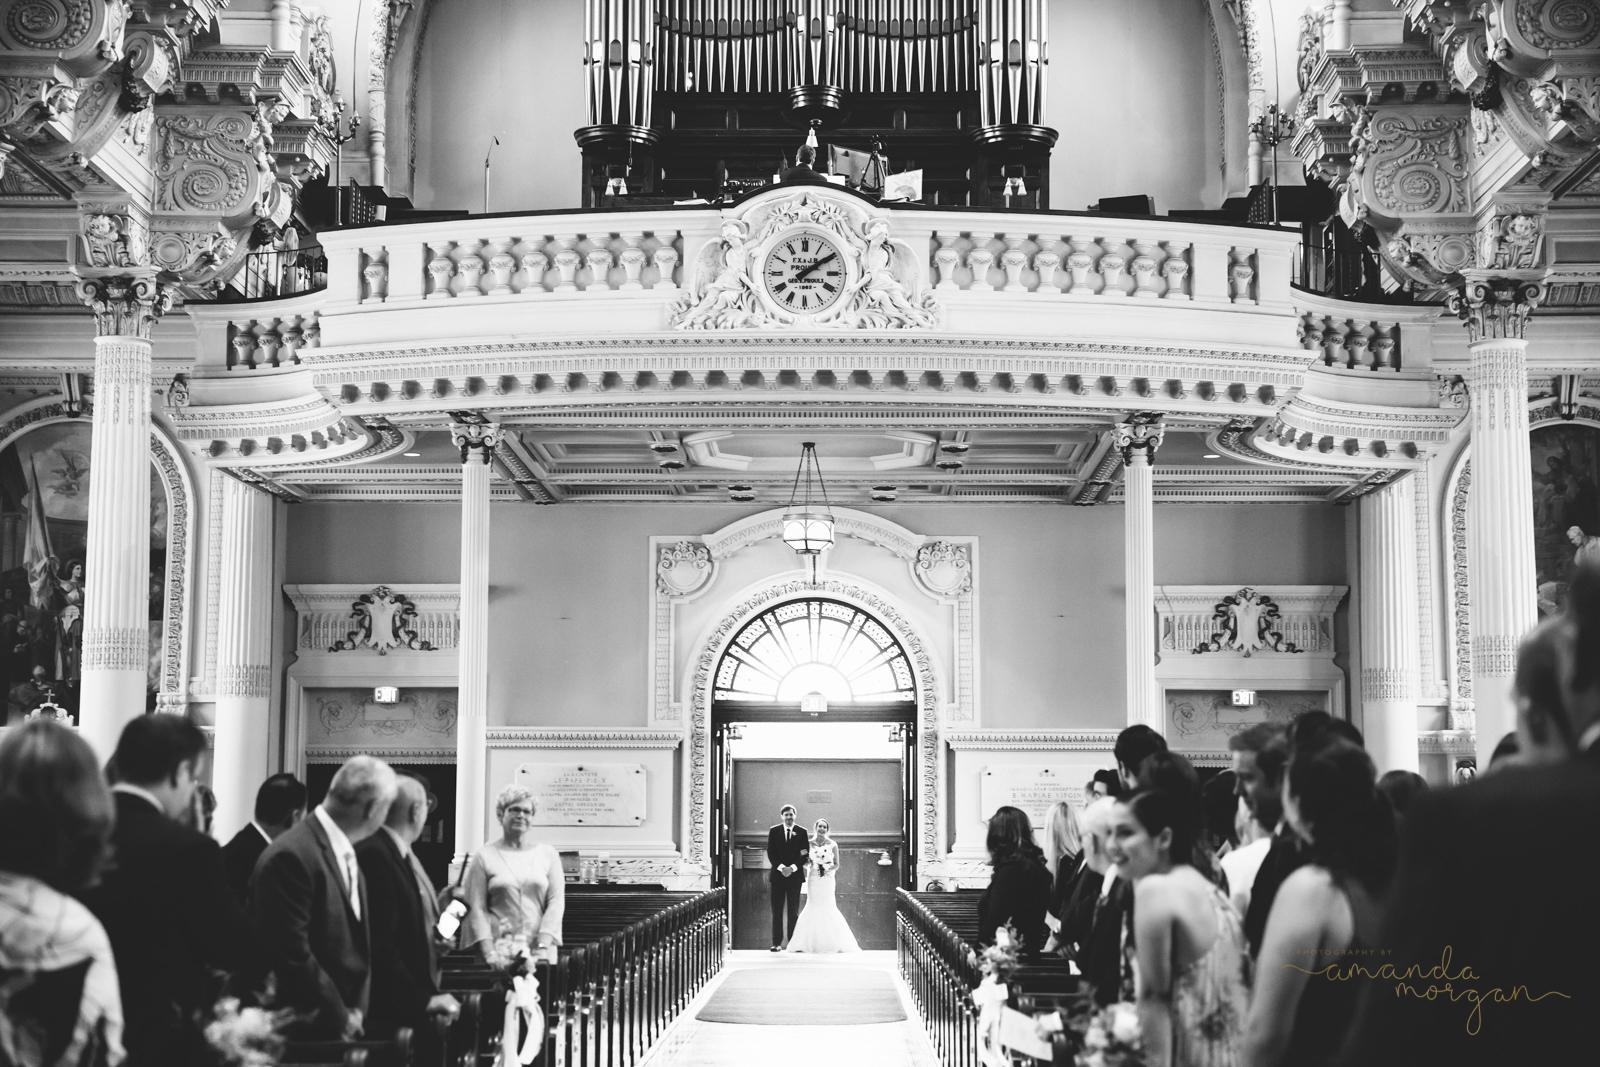 Notre-Dame-Catholic-Church-Wedding-Amanda-Morgan-3.jpg